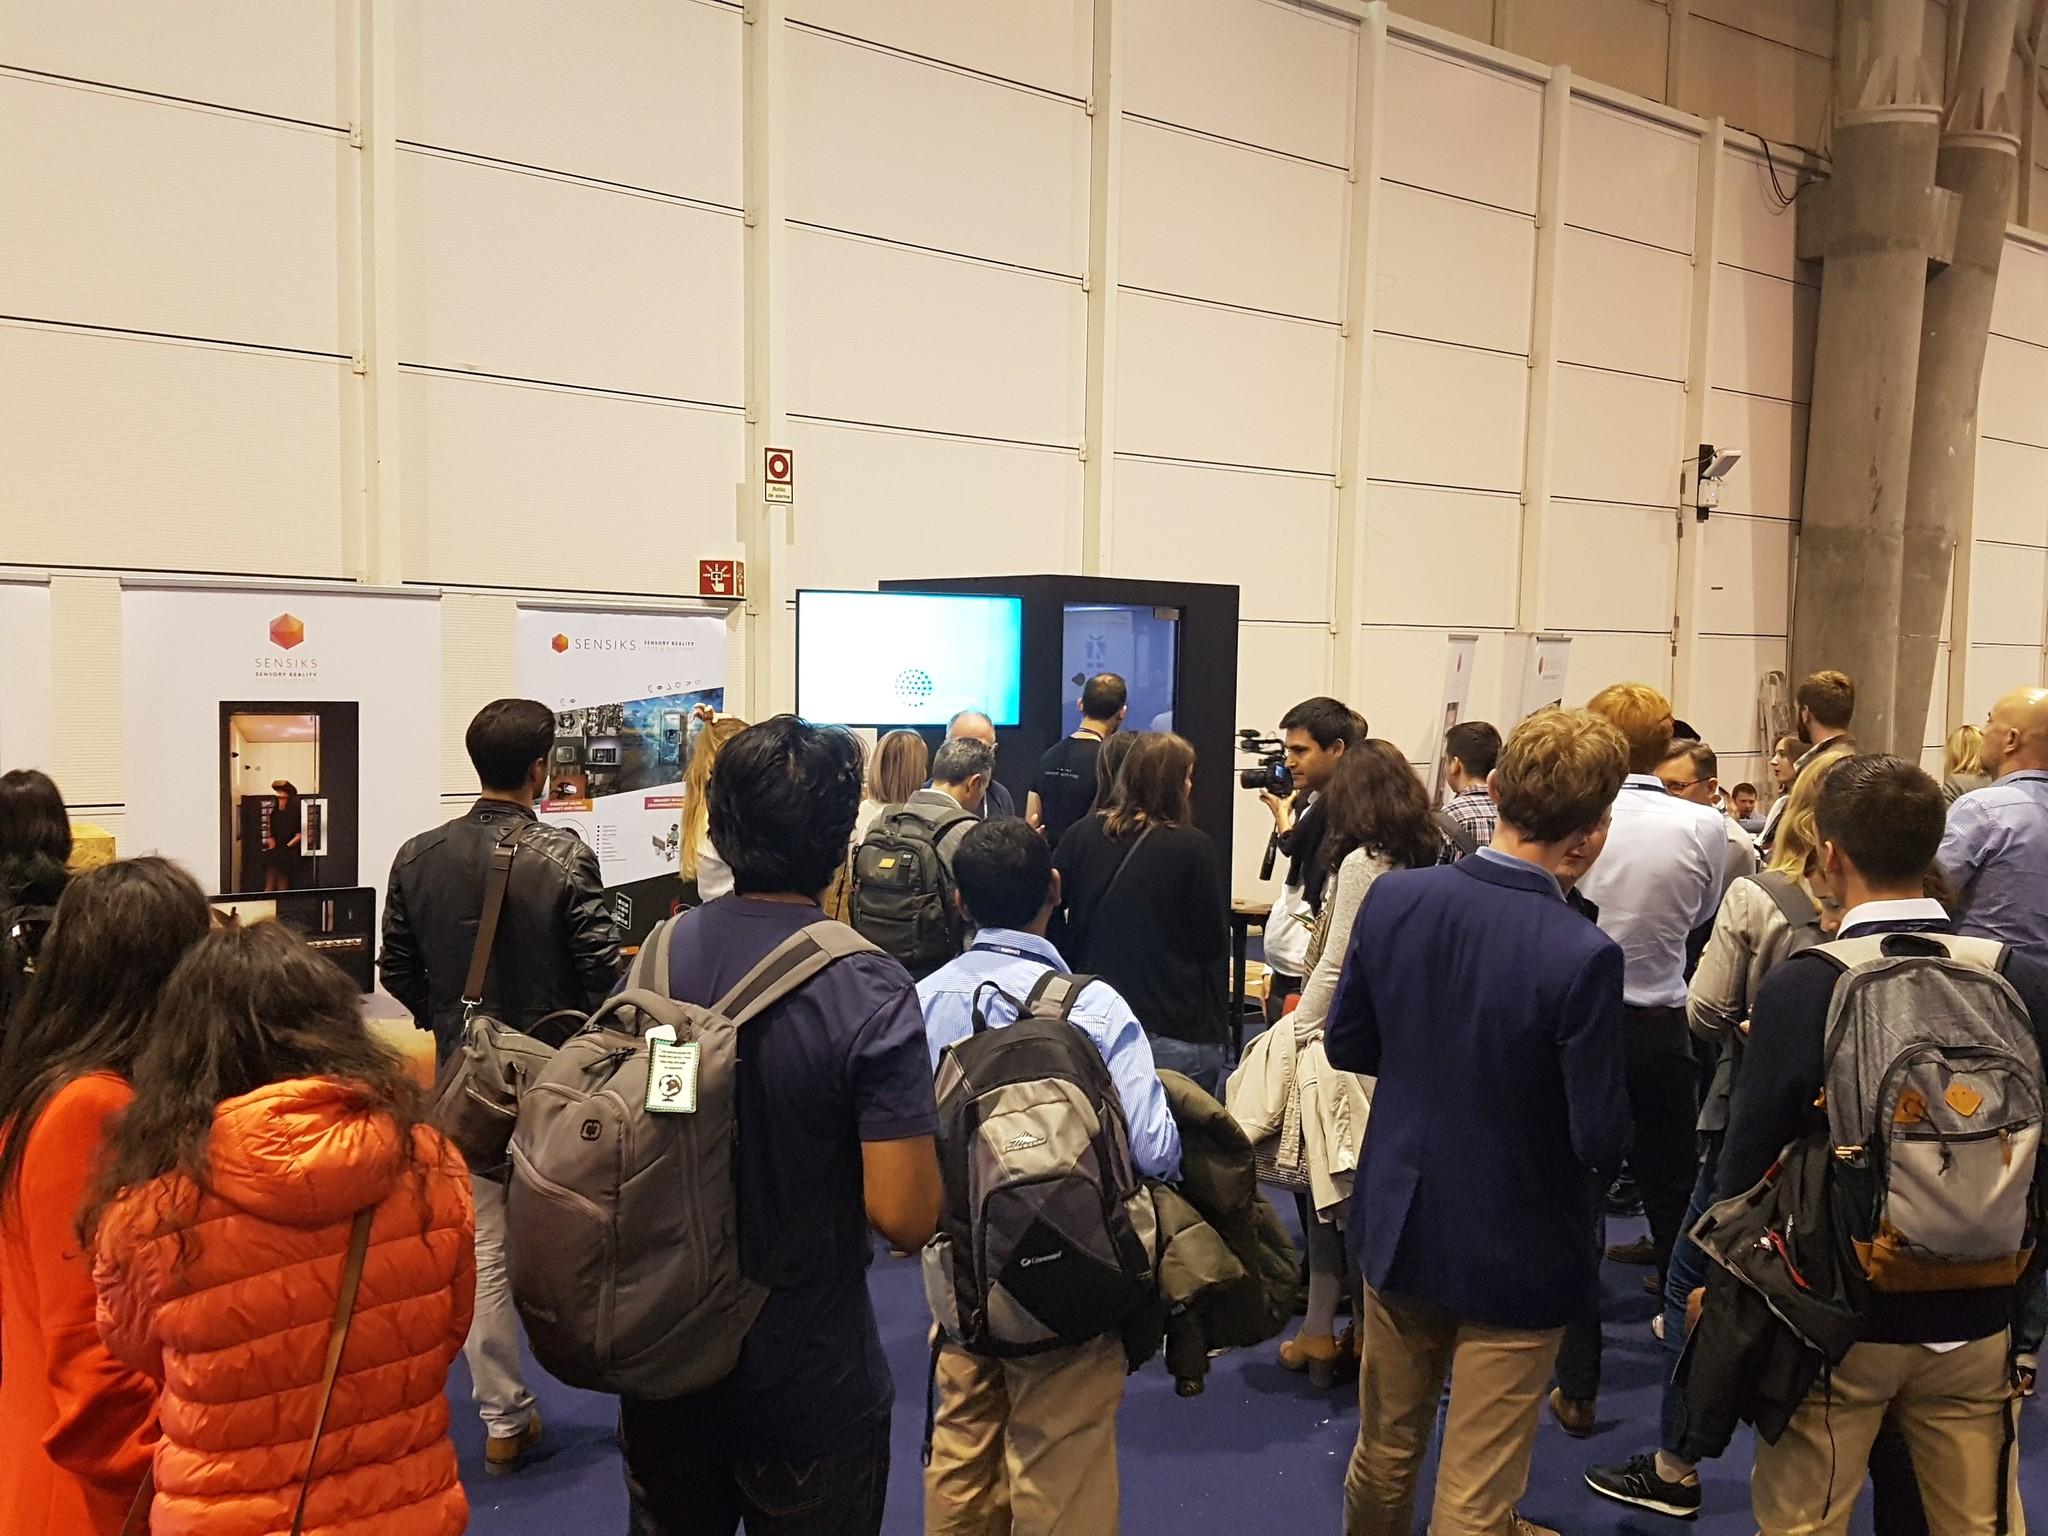 websummit virtual reality augmented reality sensiks event